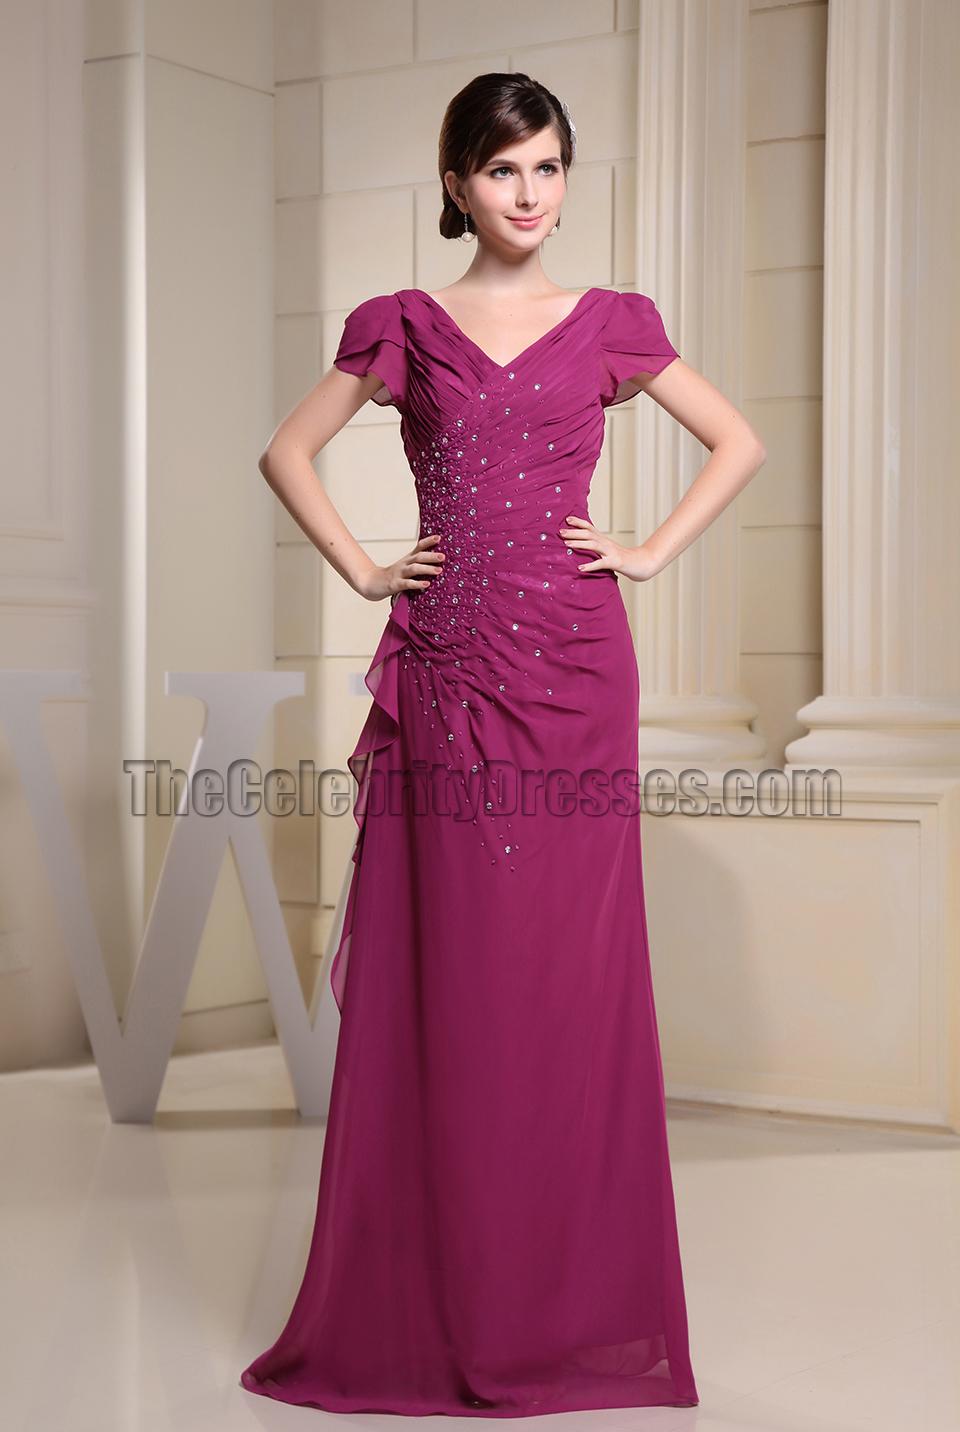 V-neck Handmade Beaded Formal Dress Prom Evening Dresses ...